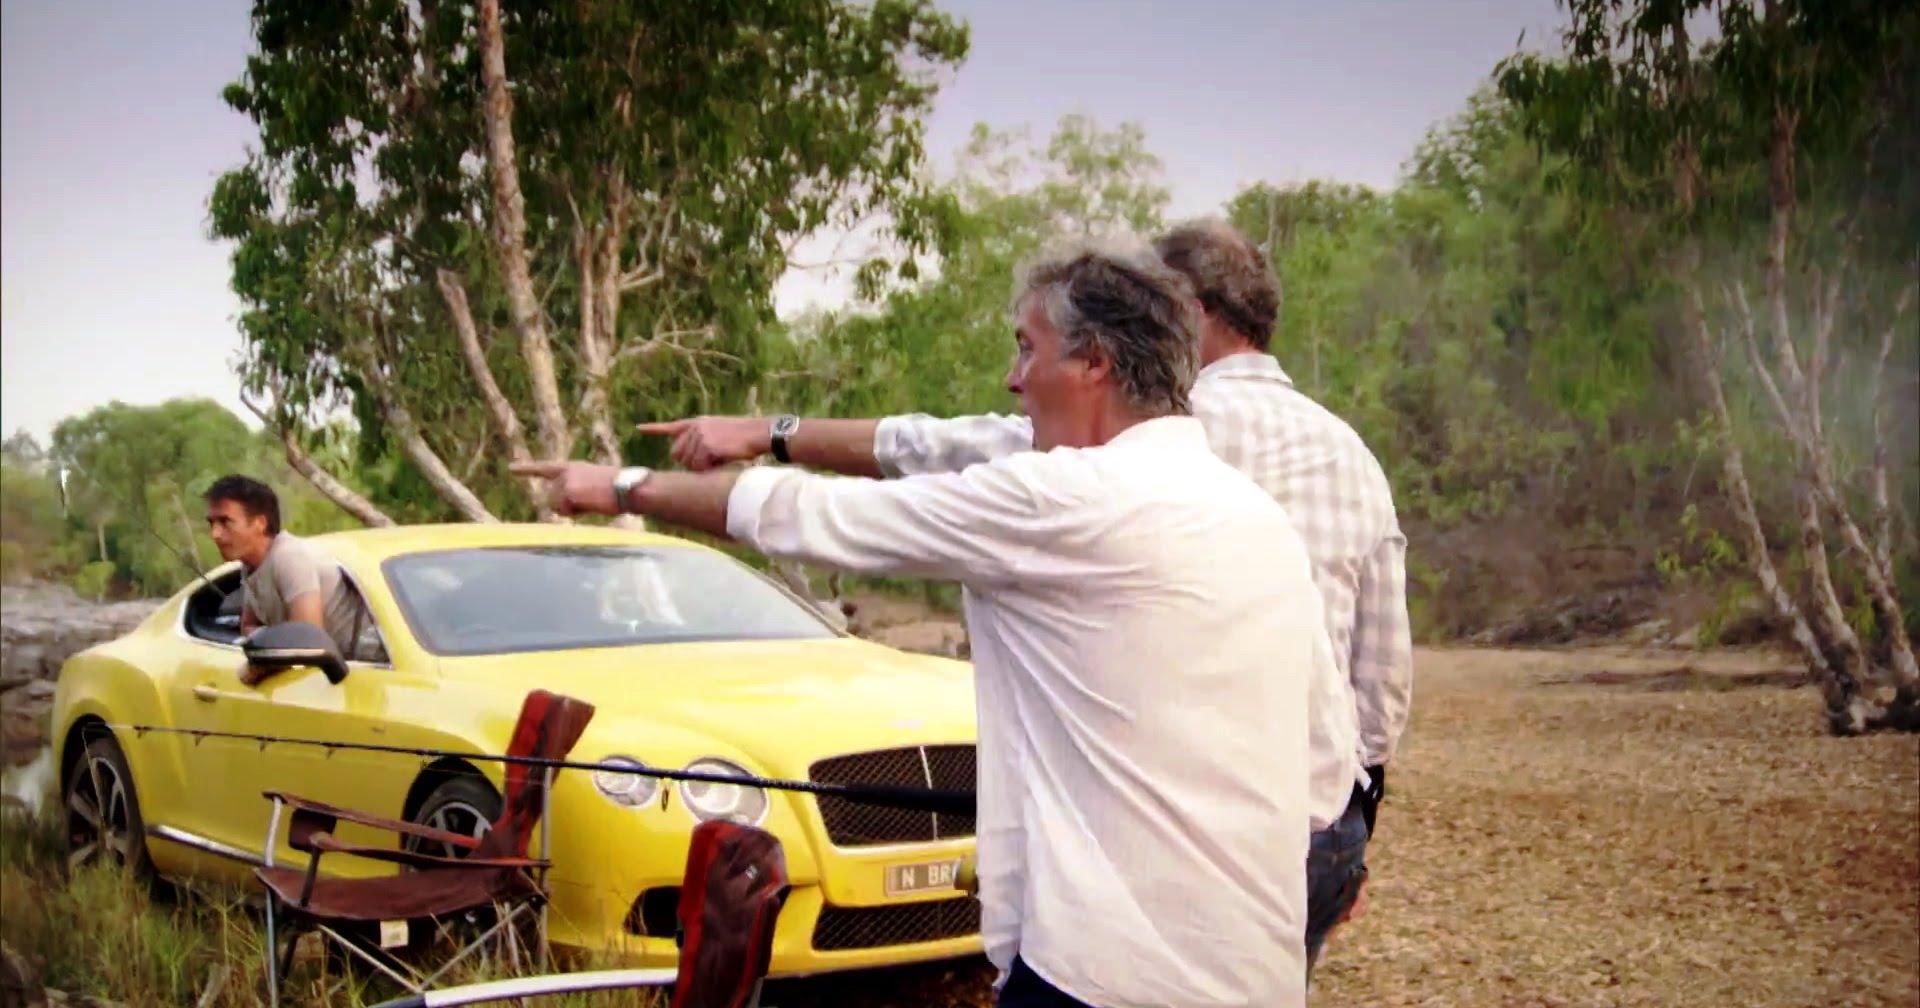 top gear series 22 episode 2 recap auto sports nation top gear series 22 episode 2 recap